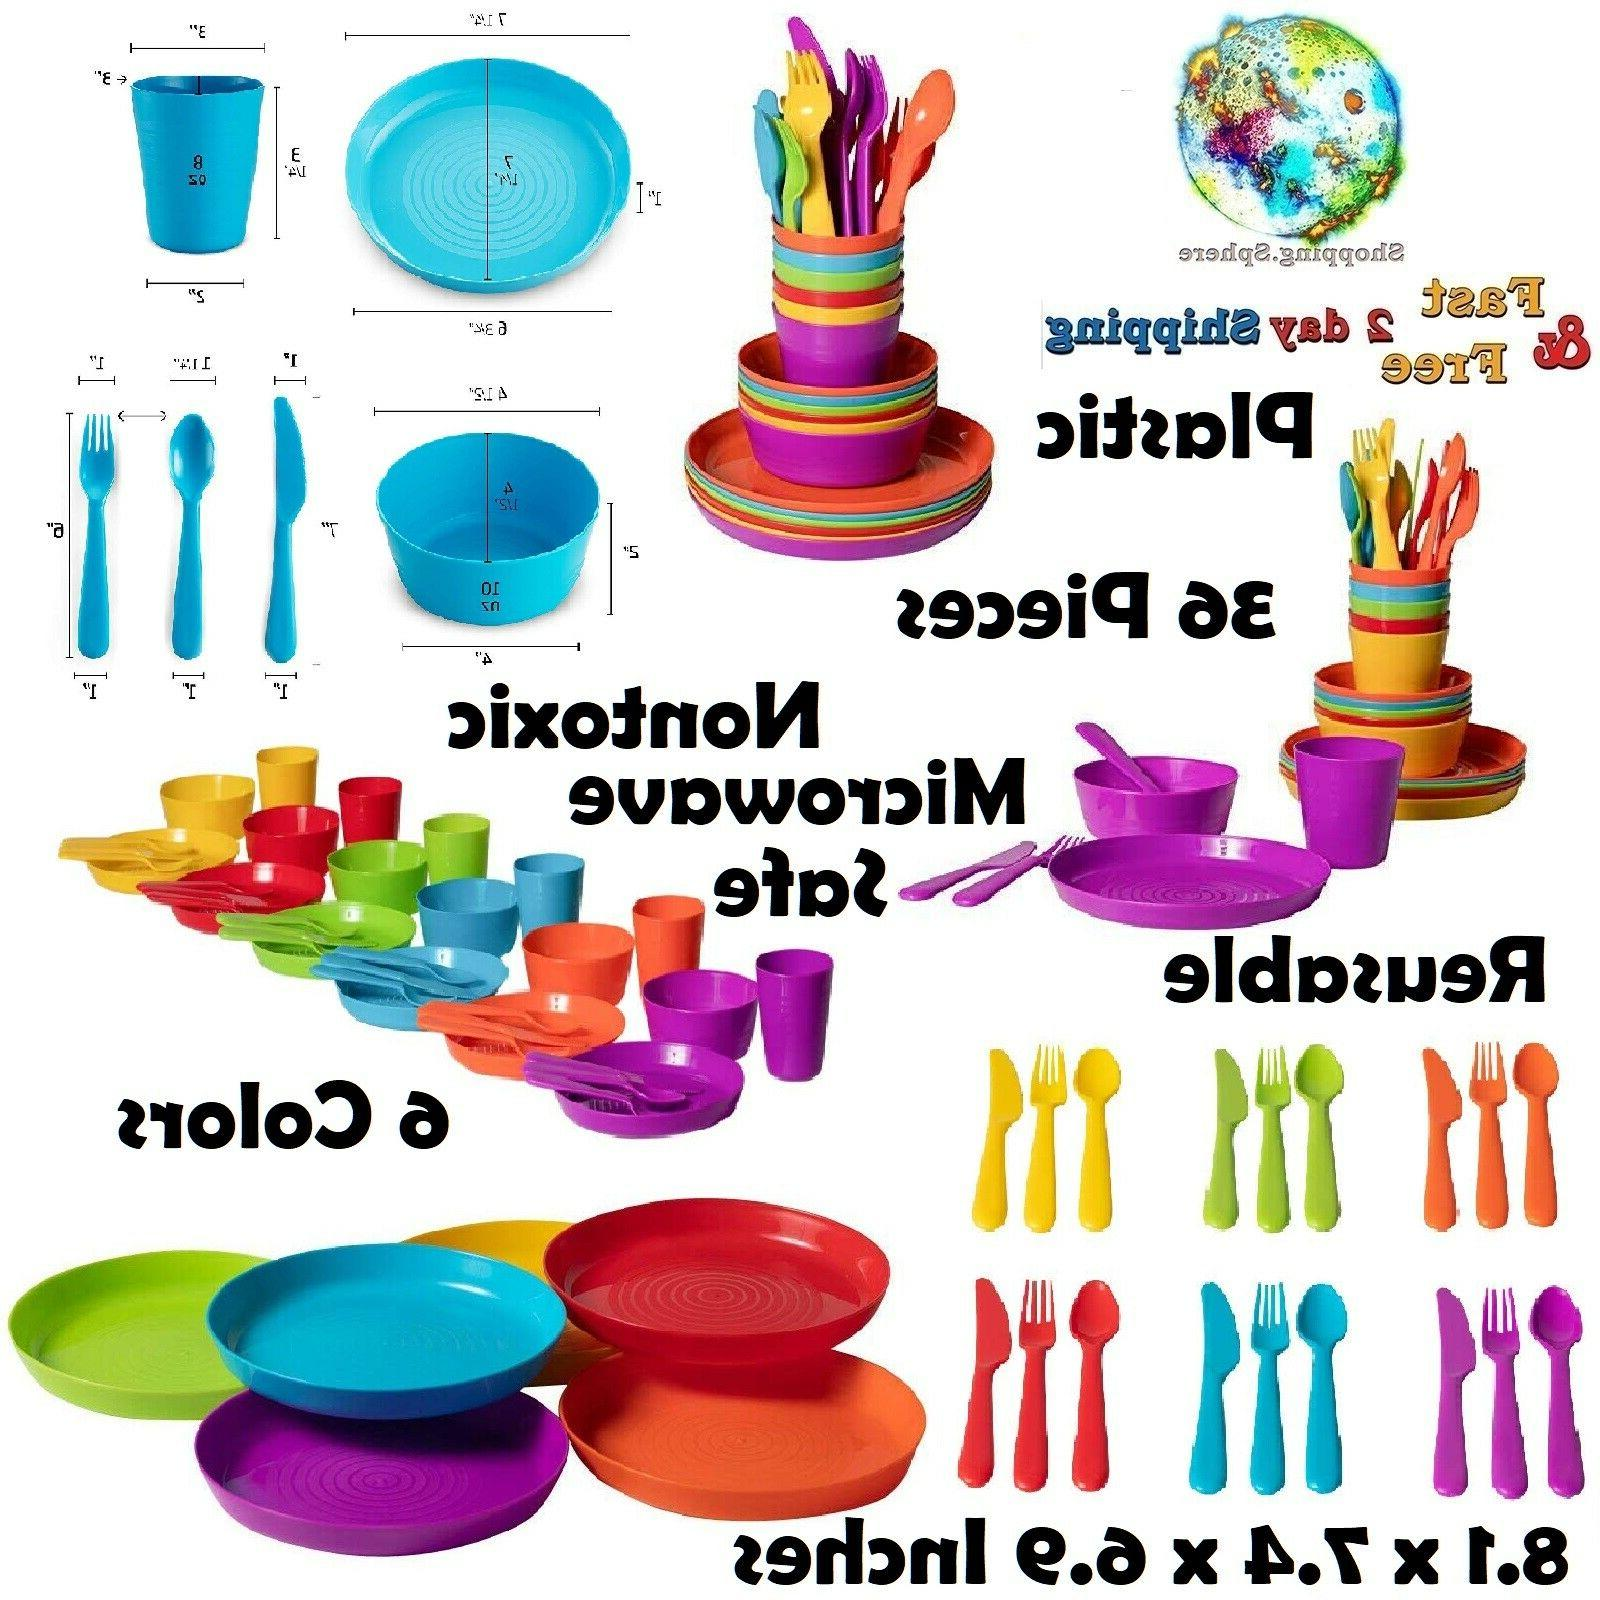 plastic dinnerware set 16 piece dinner sets